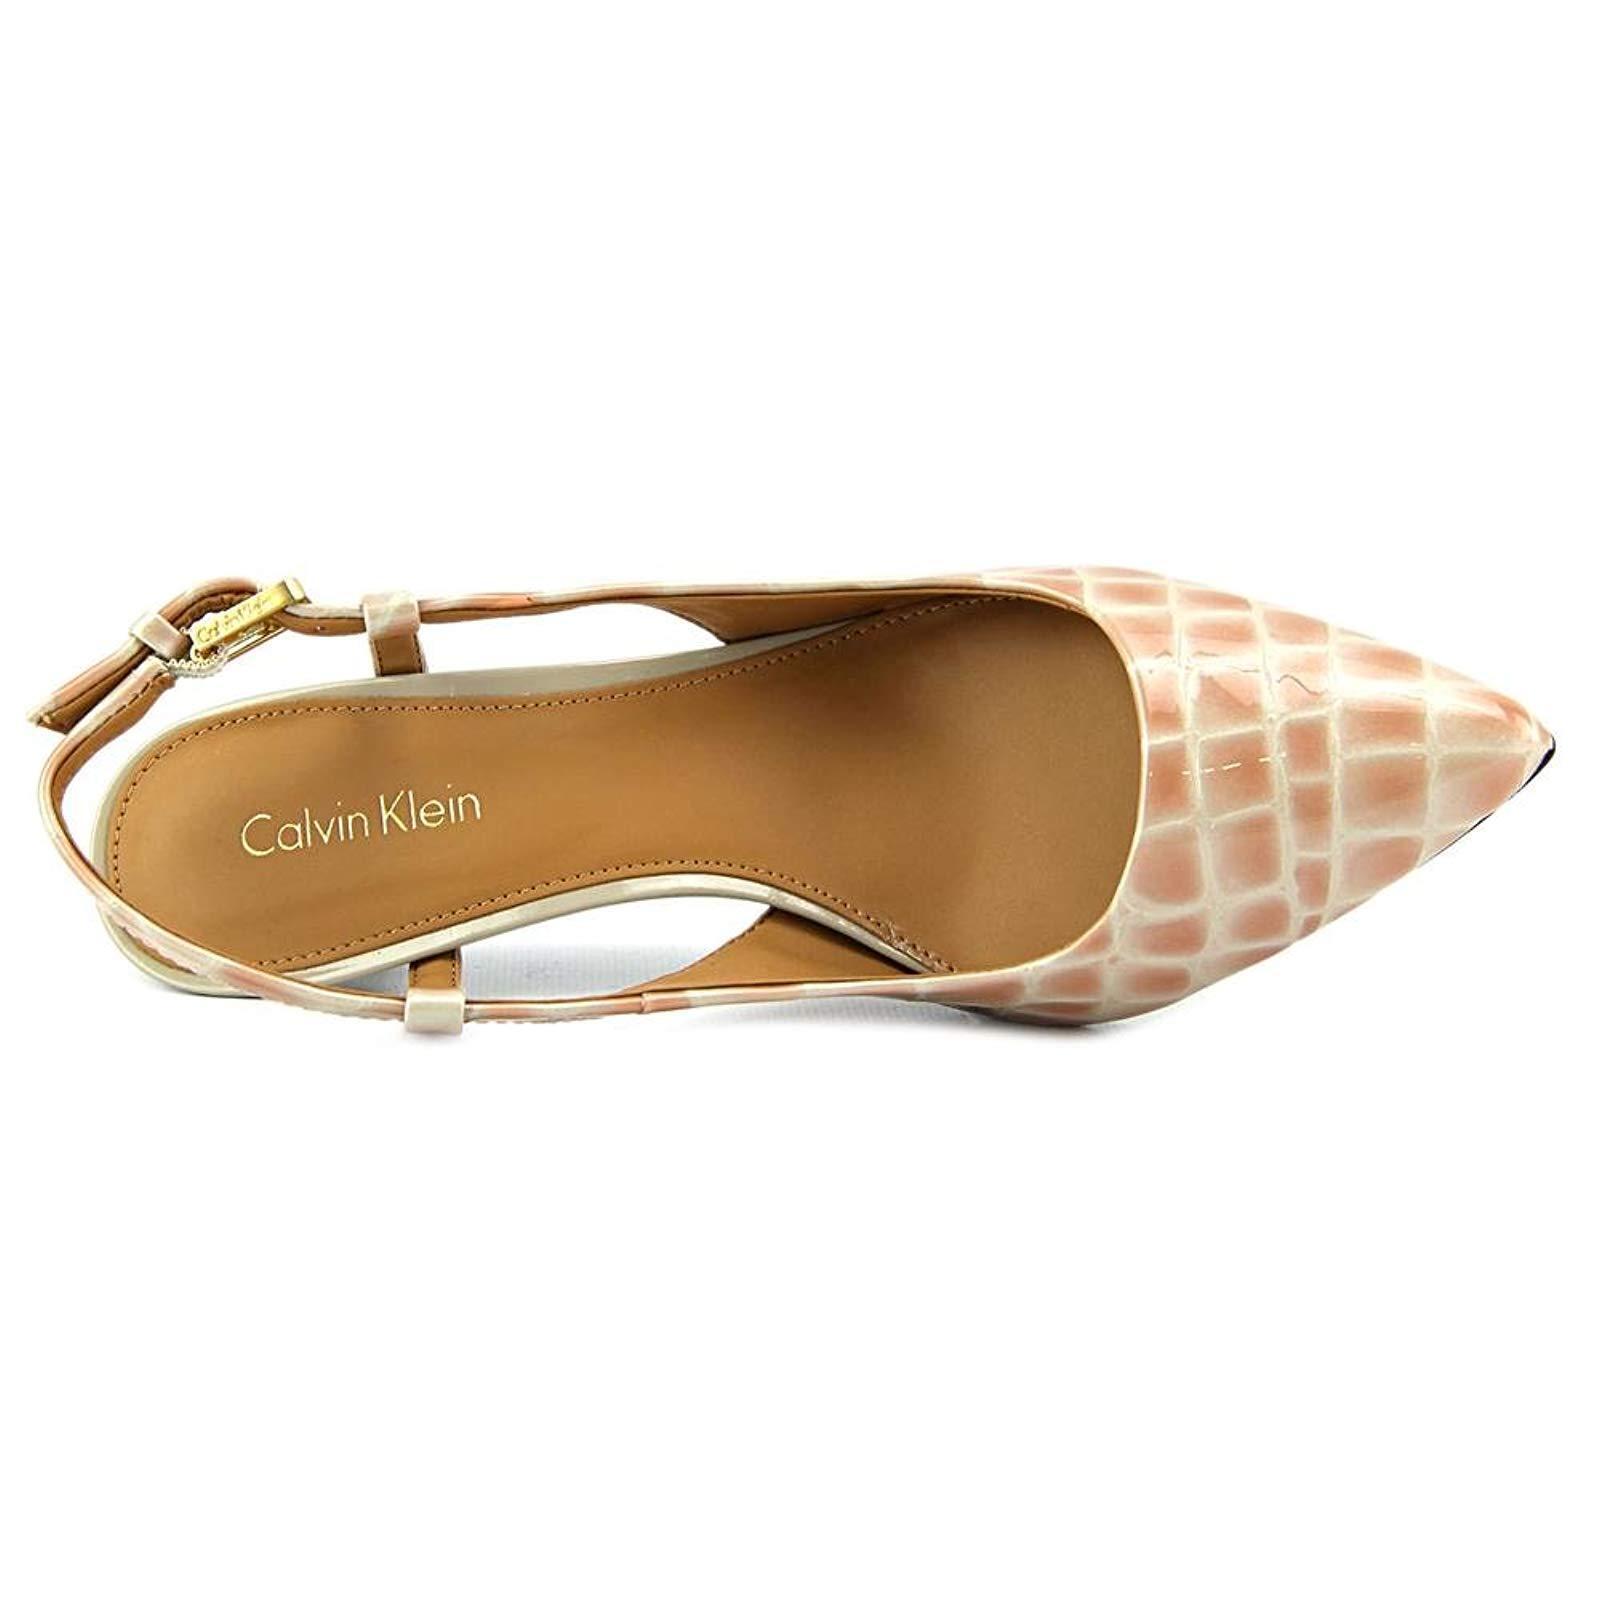 Calvin Klein Patsi Croco Patent Schuhes Clay Damens Pump Slingback Schuhes Patent 6d01aa